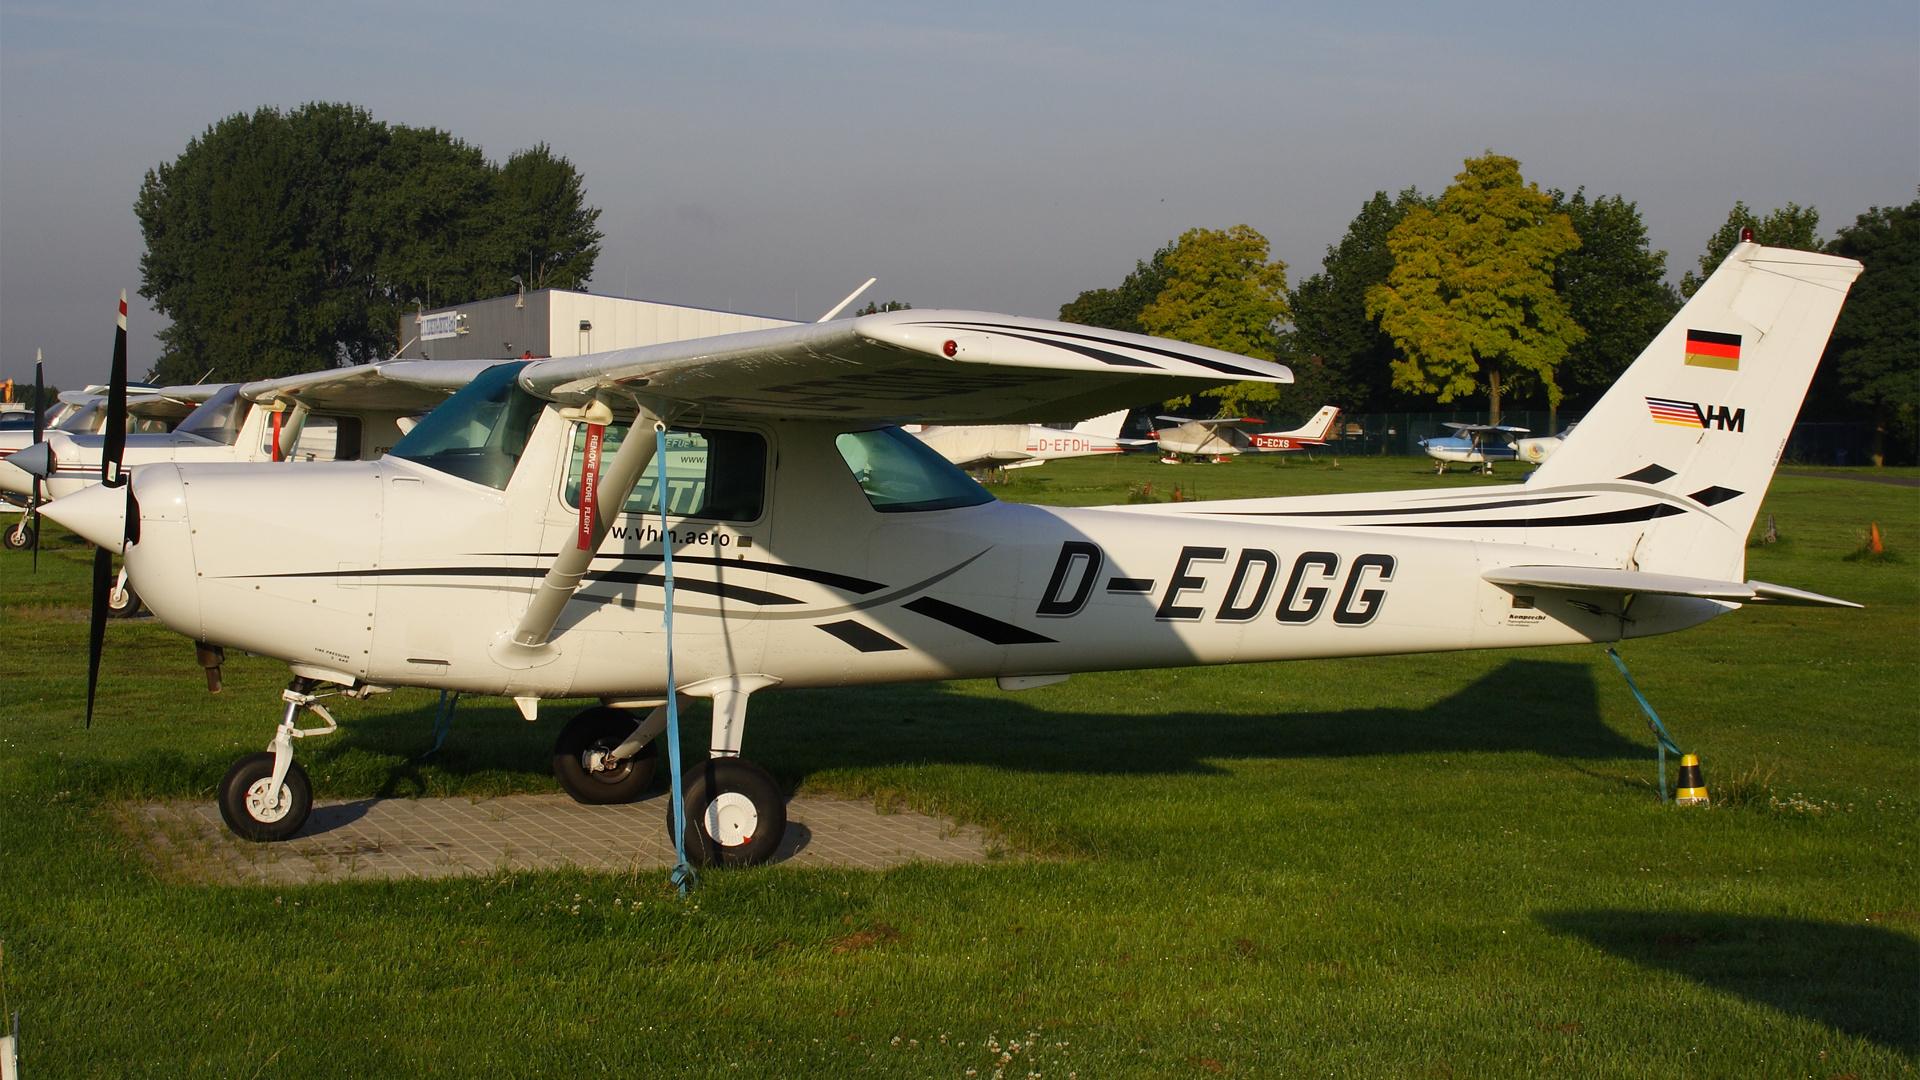 D-EDGG-1 C152  ESS 200808